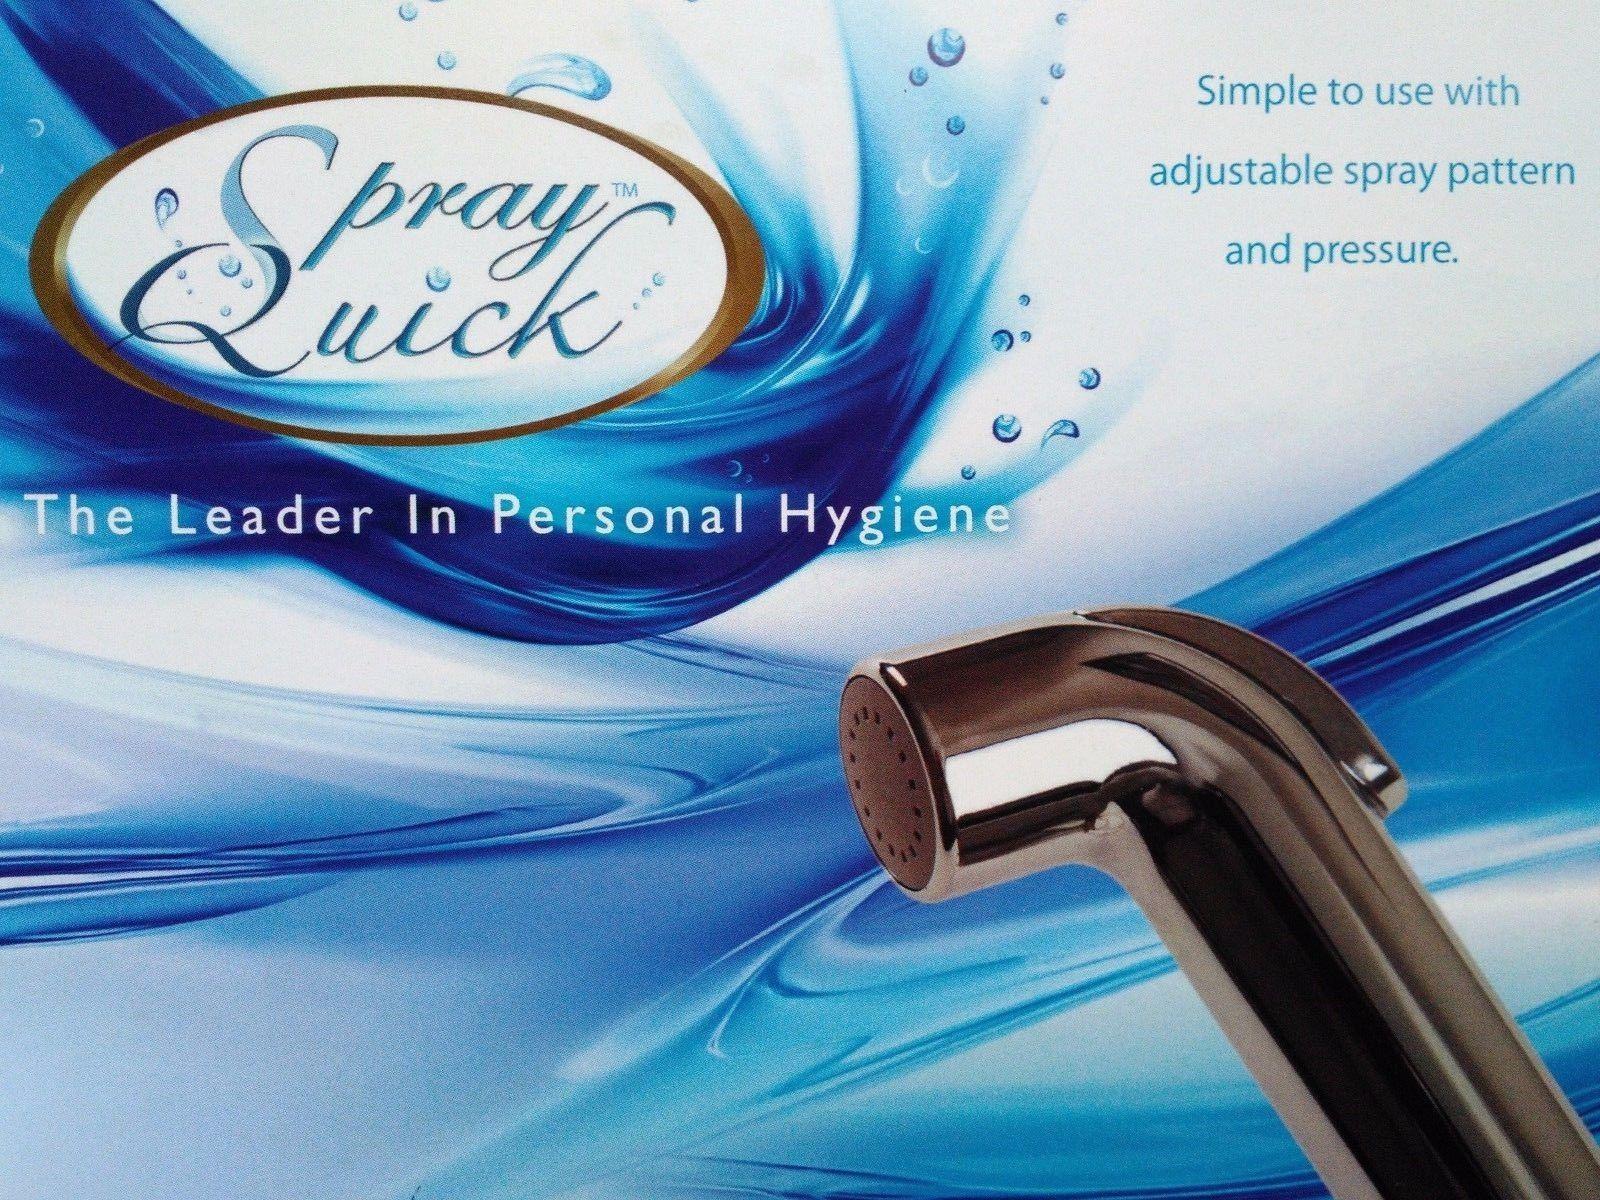 Bidet Water Sprayer White Shattaf Toilet USA High Quality